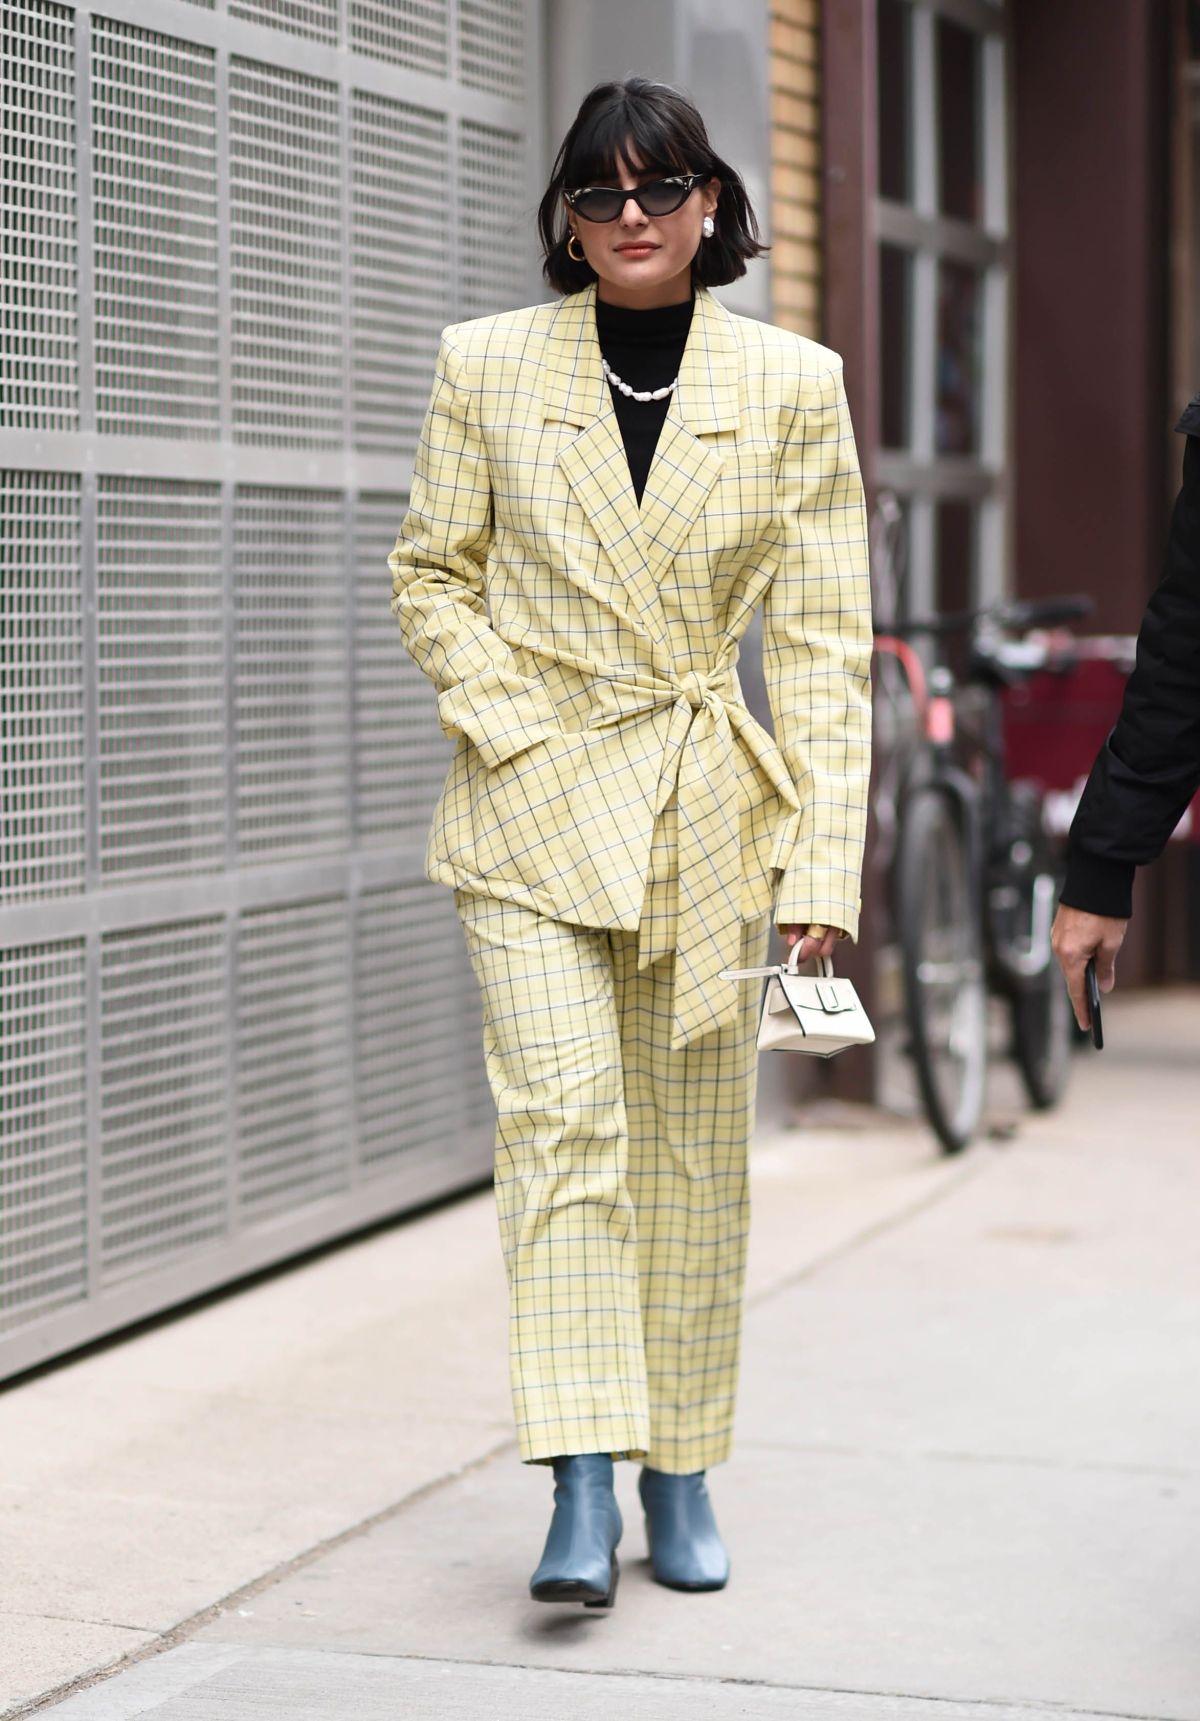 Street Style - New York Fashion Week February 2019 - Day 4